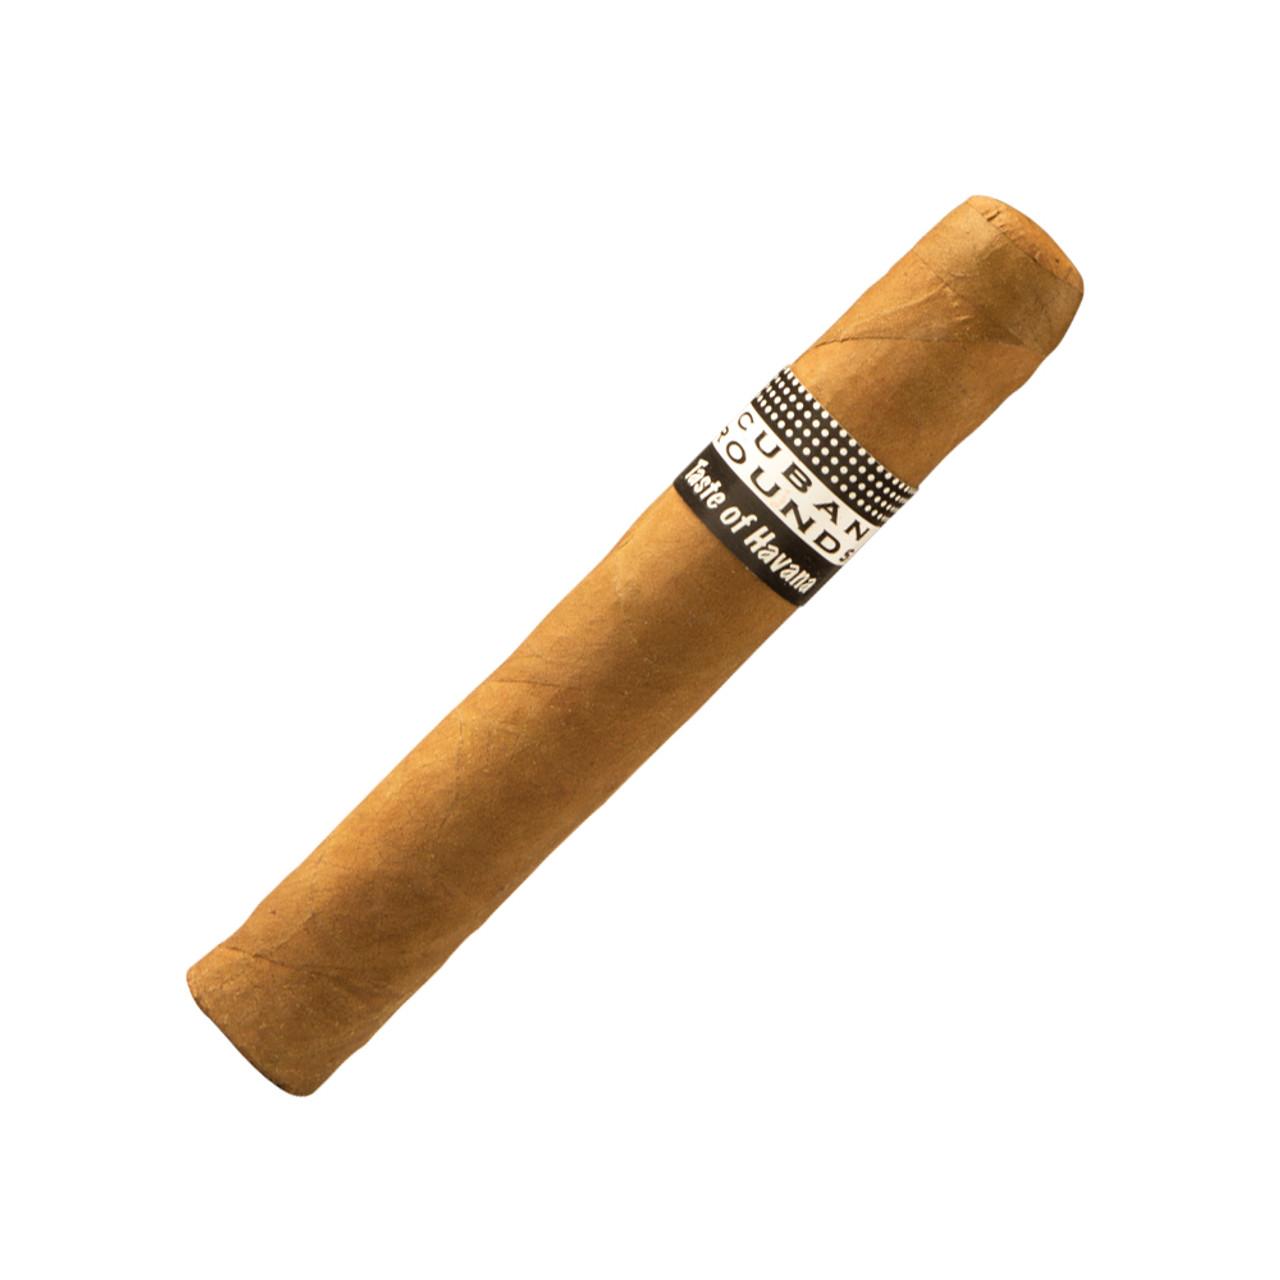 Cuban Rounds Robusto Cigars - 5 x 50 (Bundle of 20)